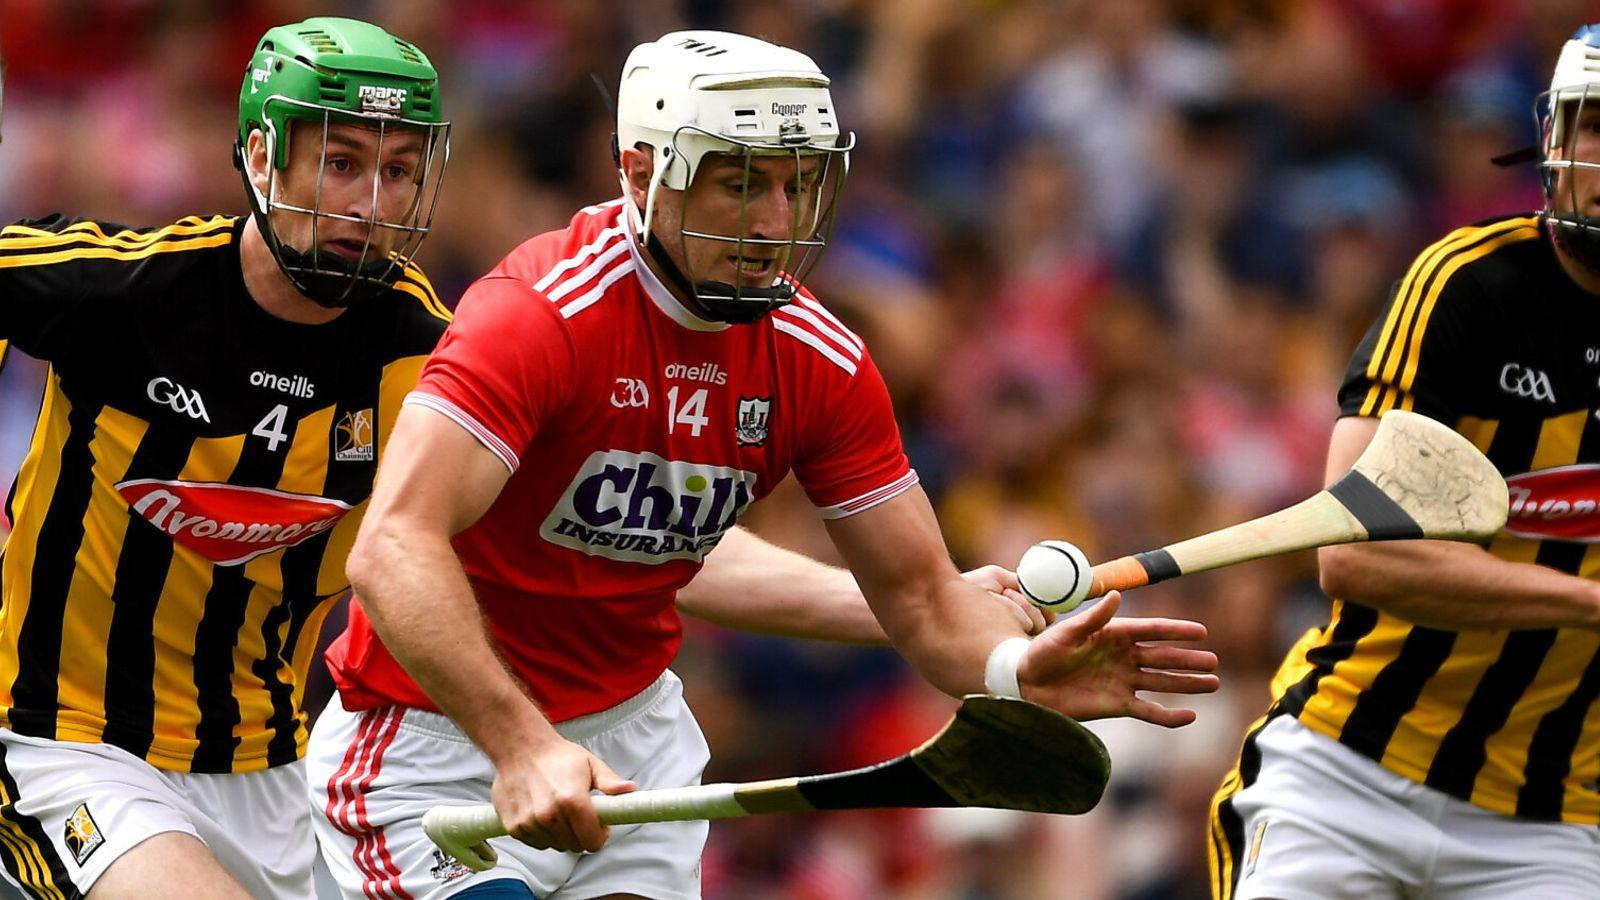 Limerick vs Waterford and Kilkenny vs Cork predictions: JJ Delaney and Noel Connors make their picks